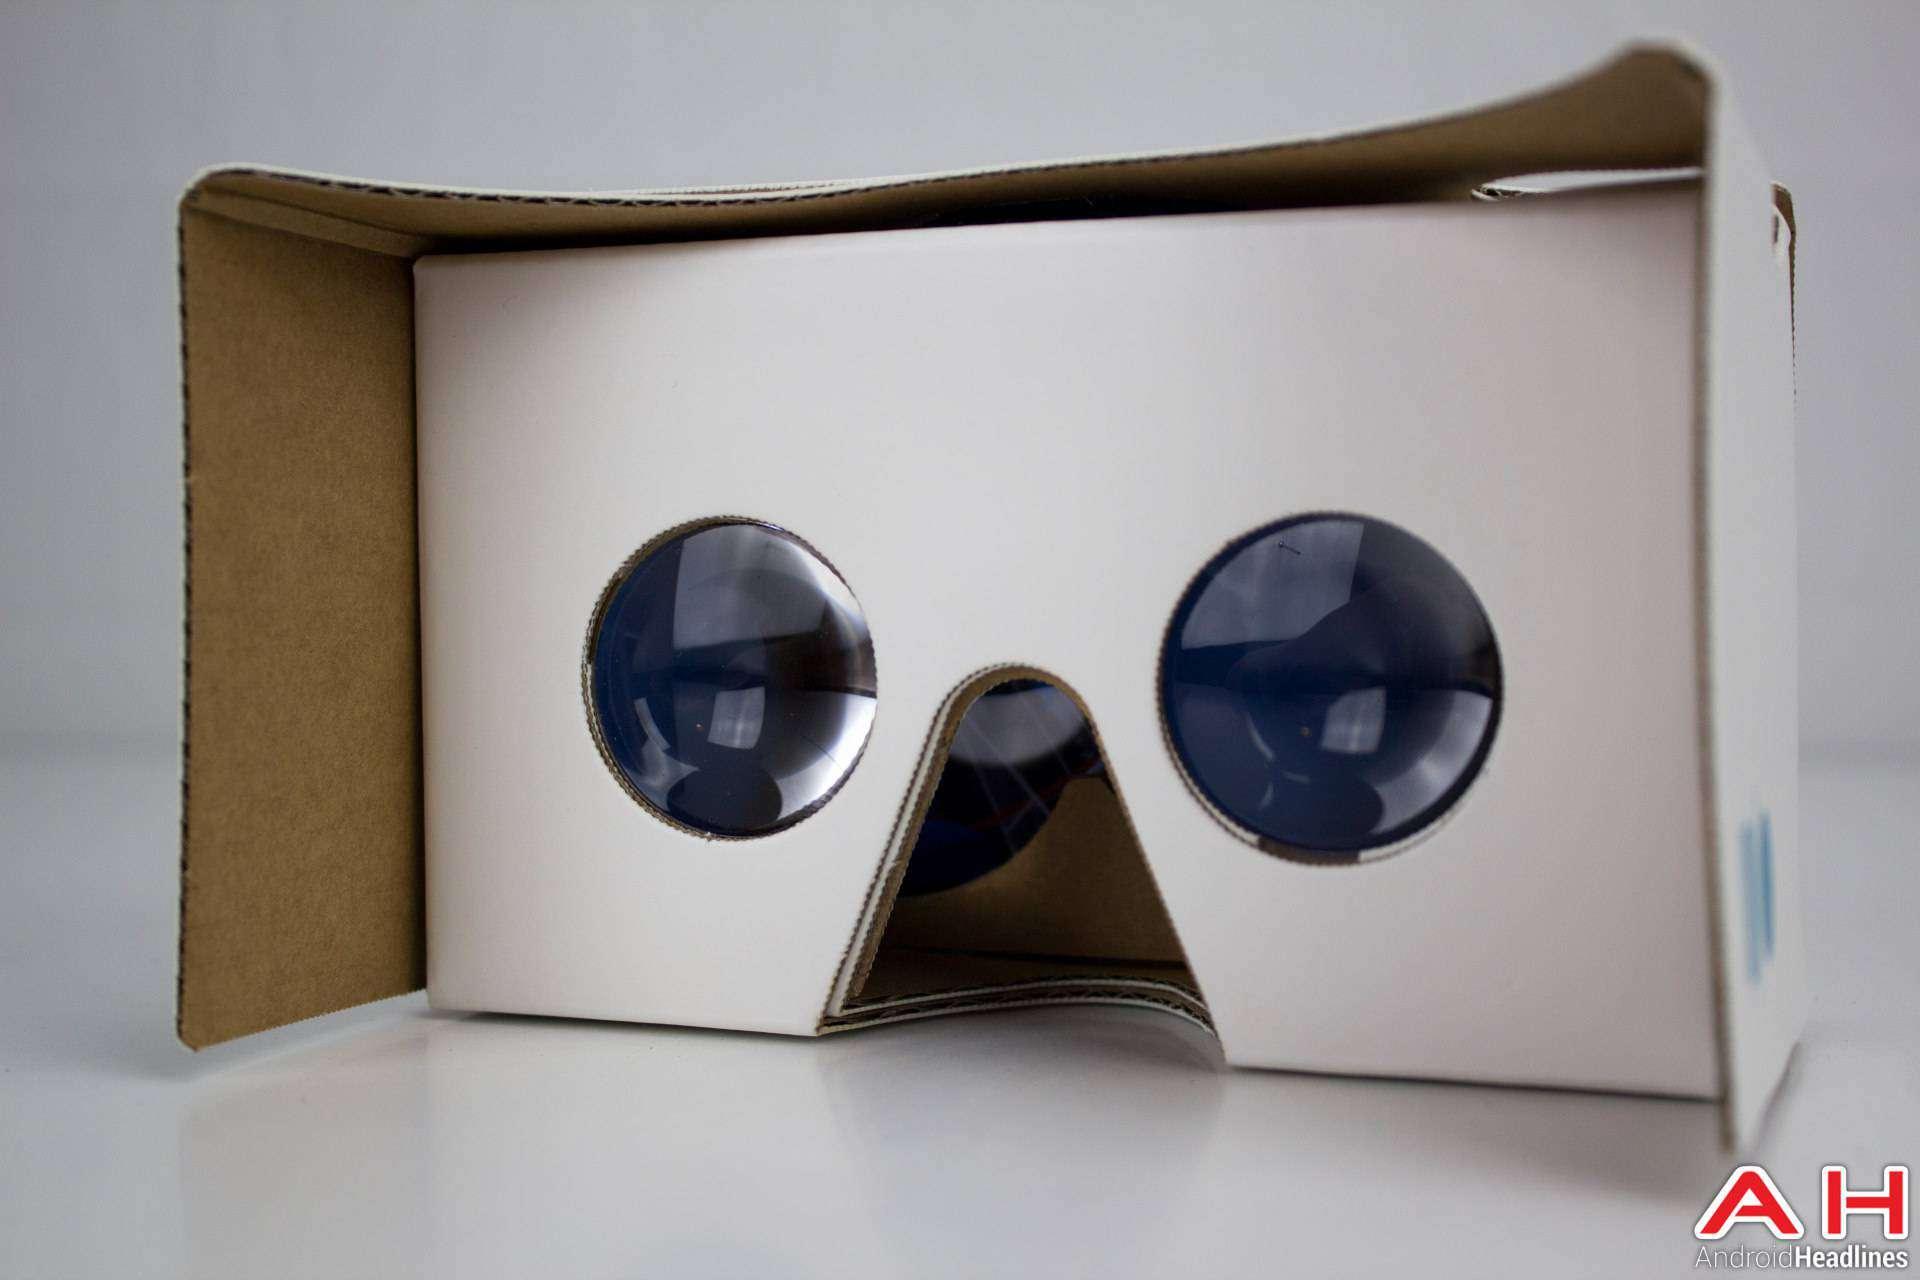 Sony-Xperia-X-AH-NS-Google-cardboard-VR